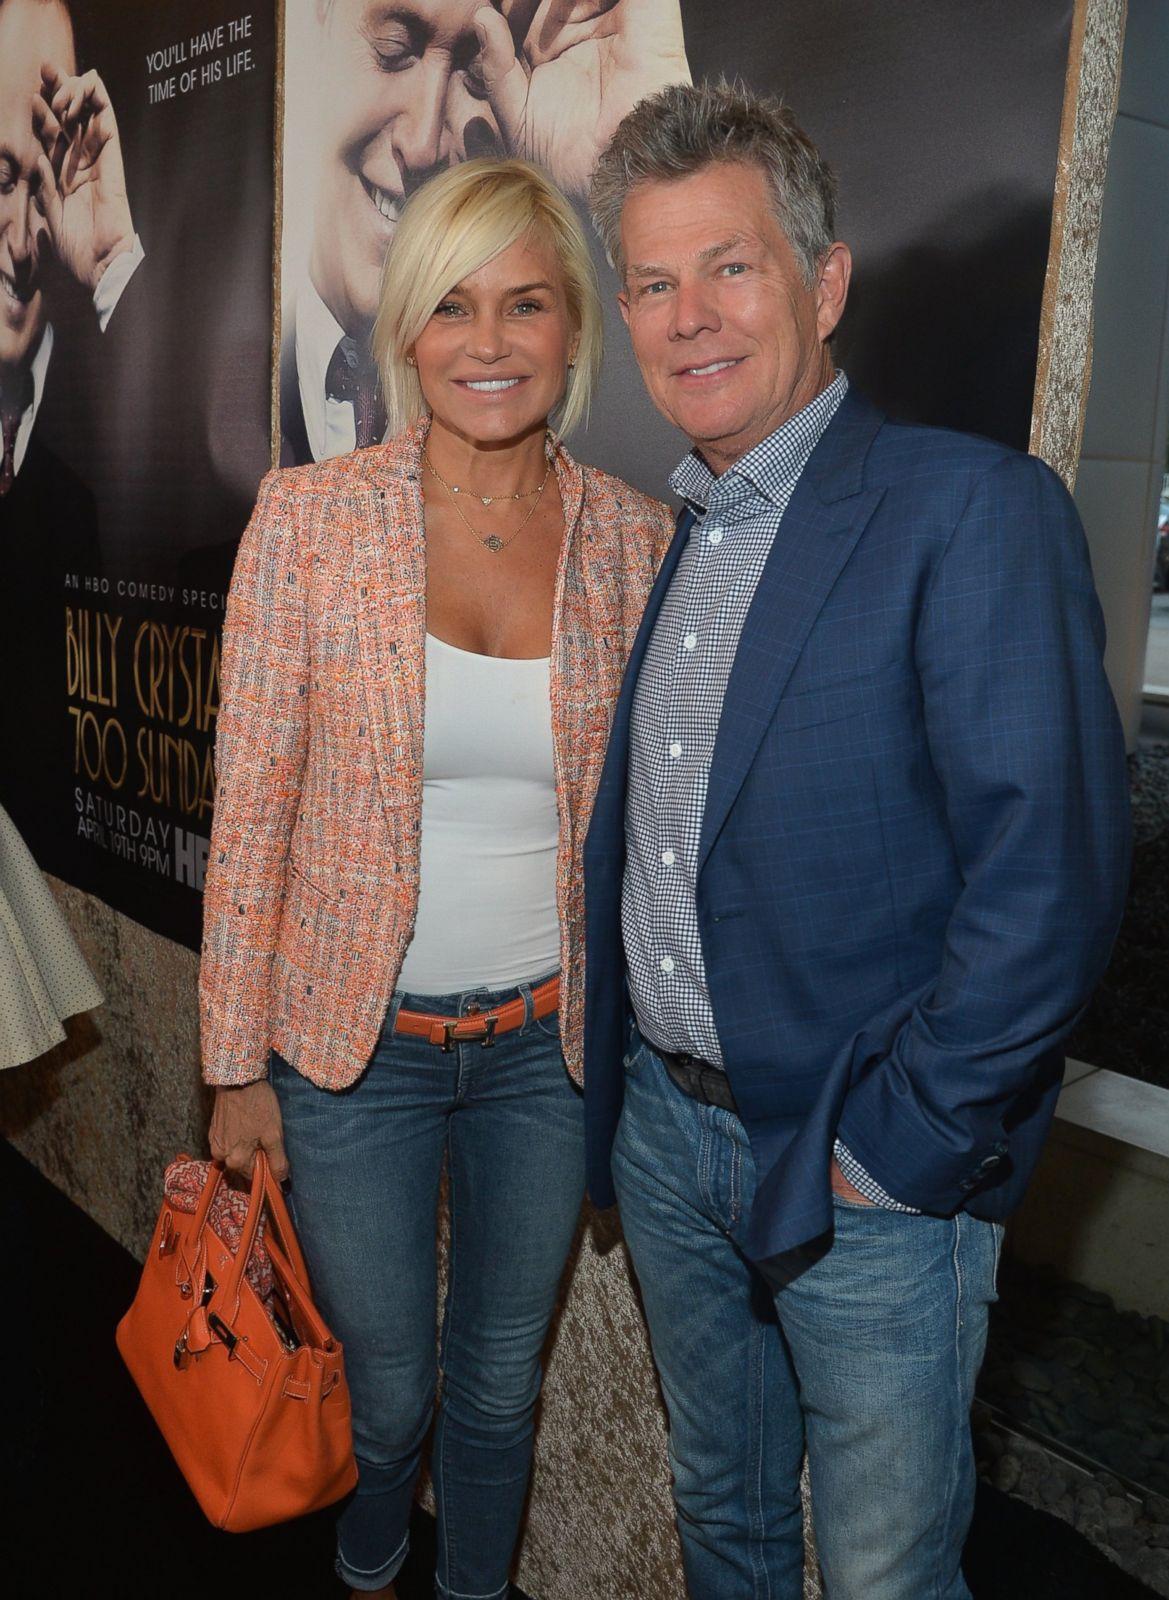 Yolanda and David Foster Picture | Star Spotting: April's ...